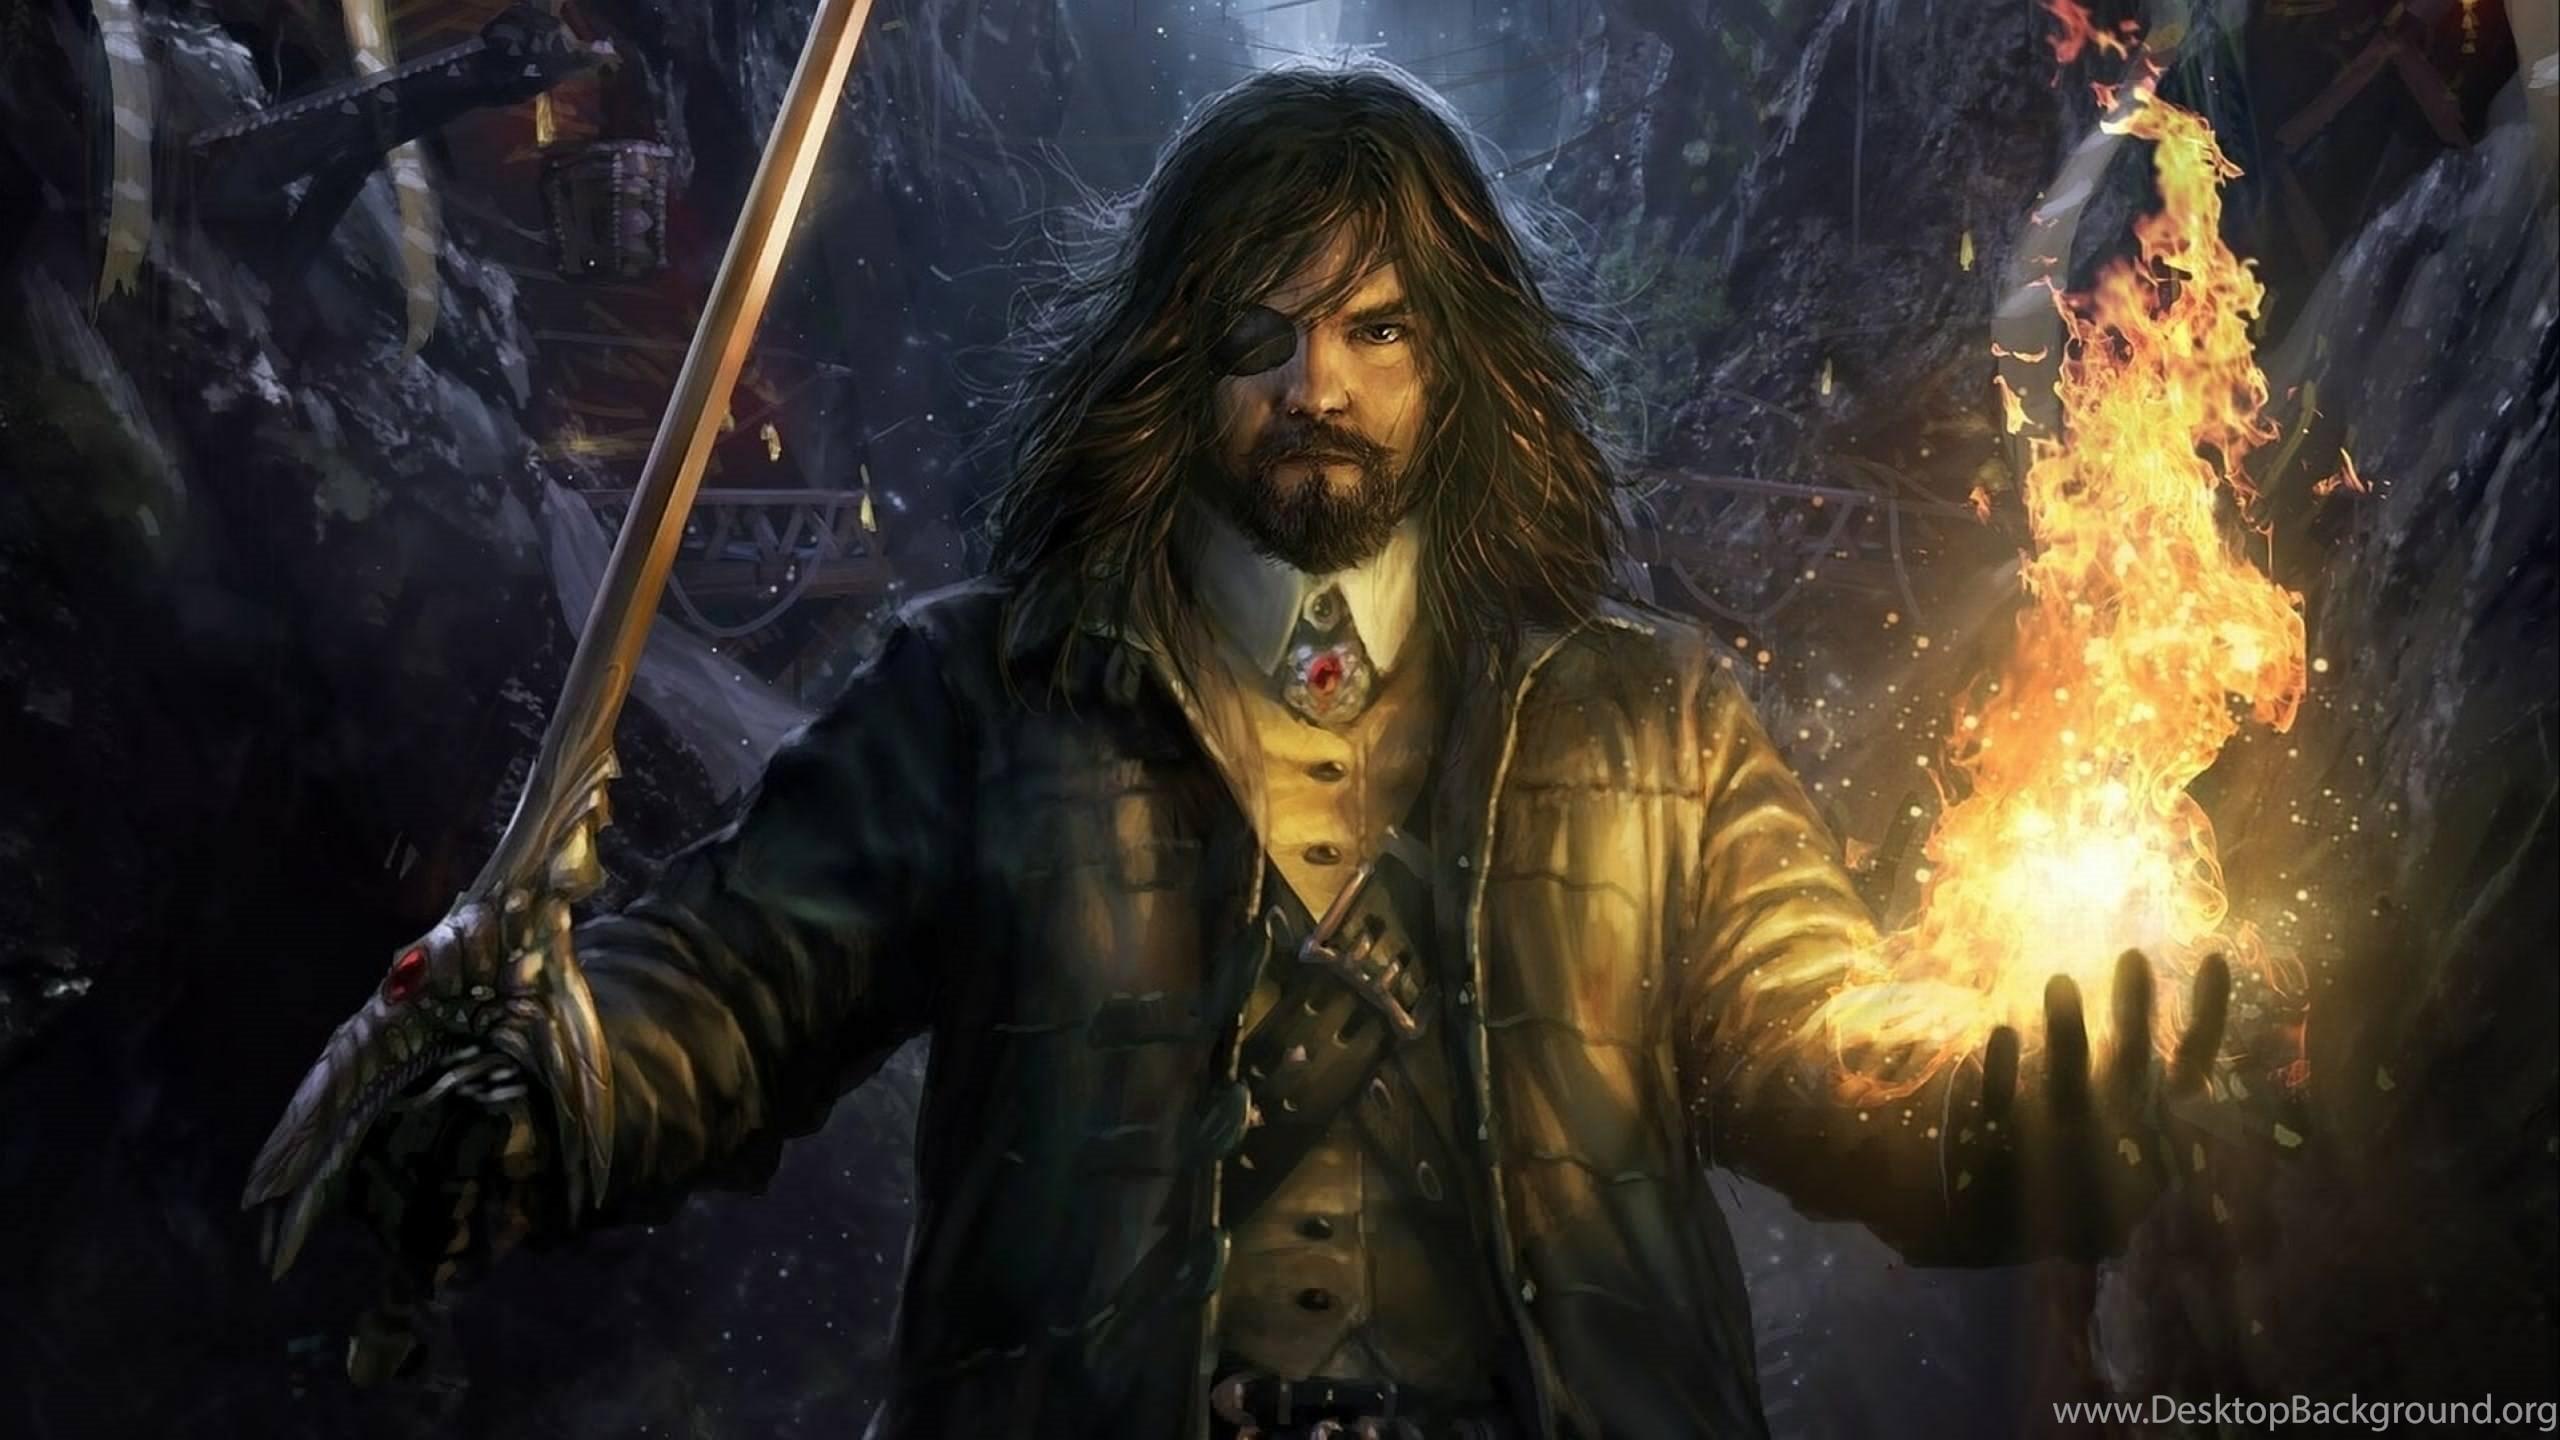 Fantasy Wizard Background 1 Hd Wallpapers: Fantasy Mage Wizard Sorcerer Art Artwork Magic Magician